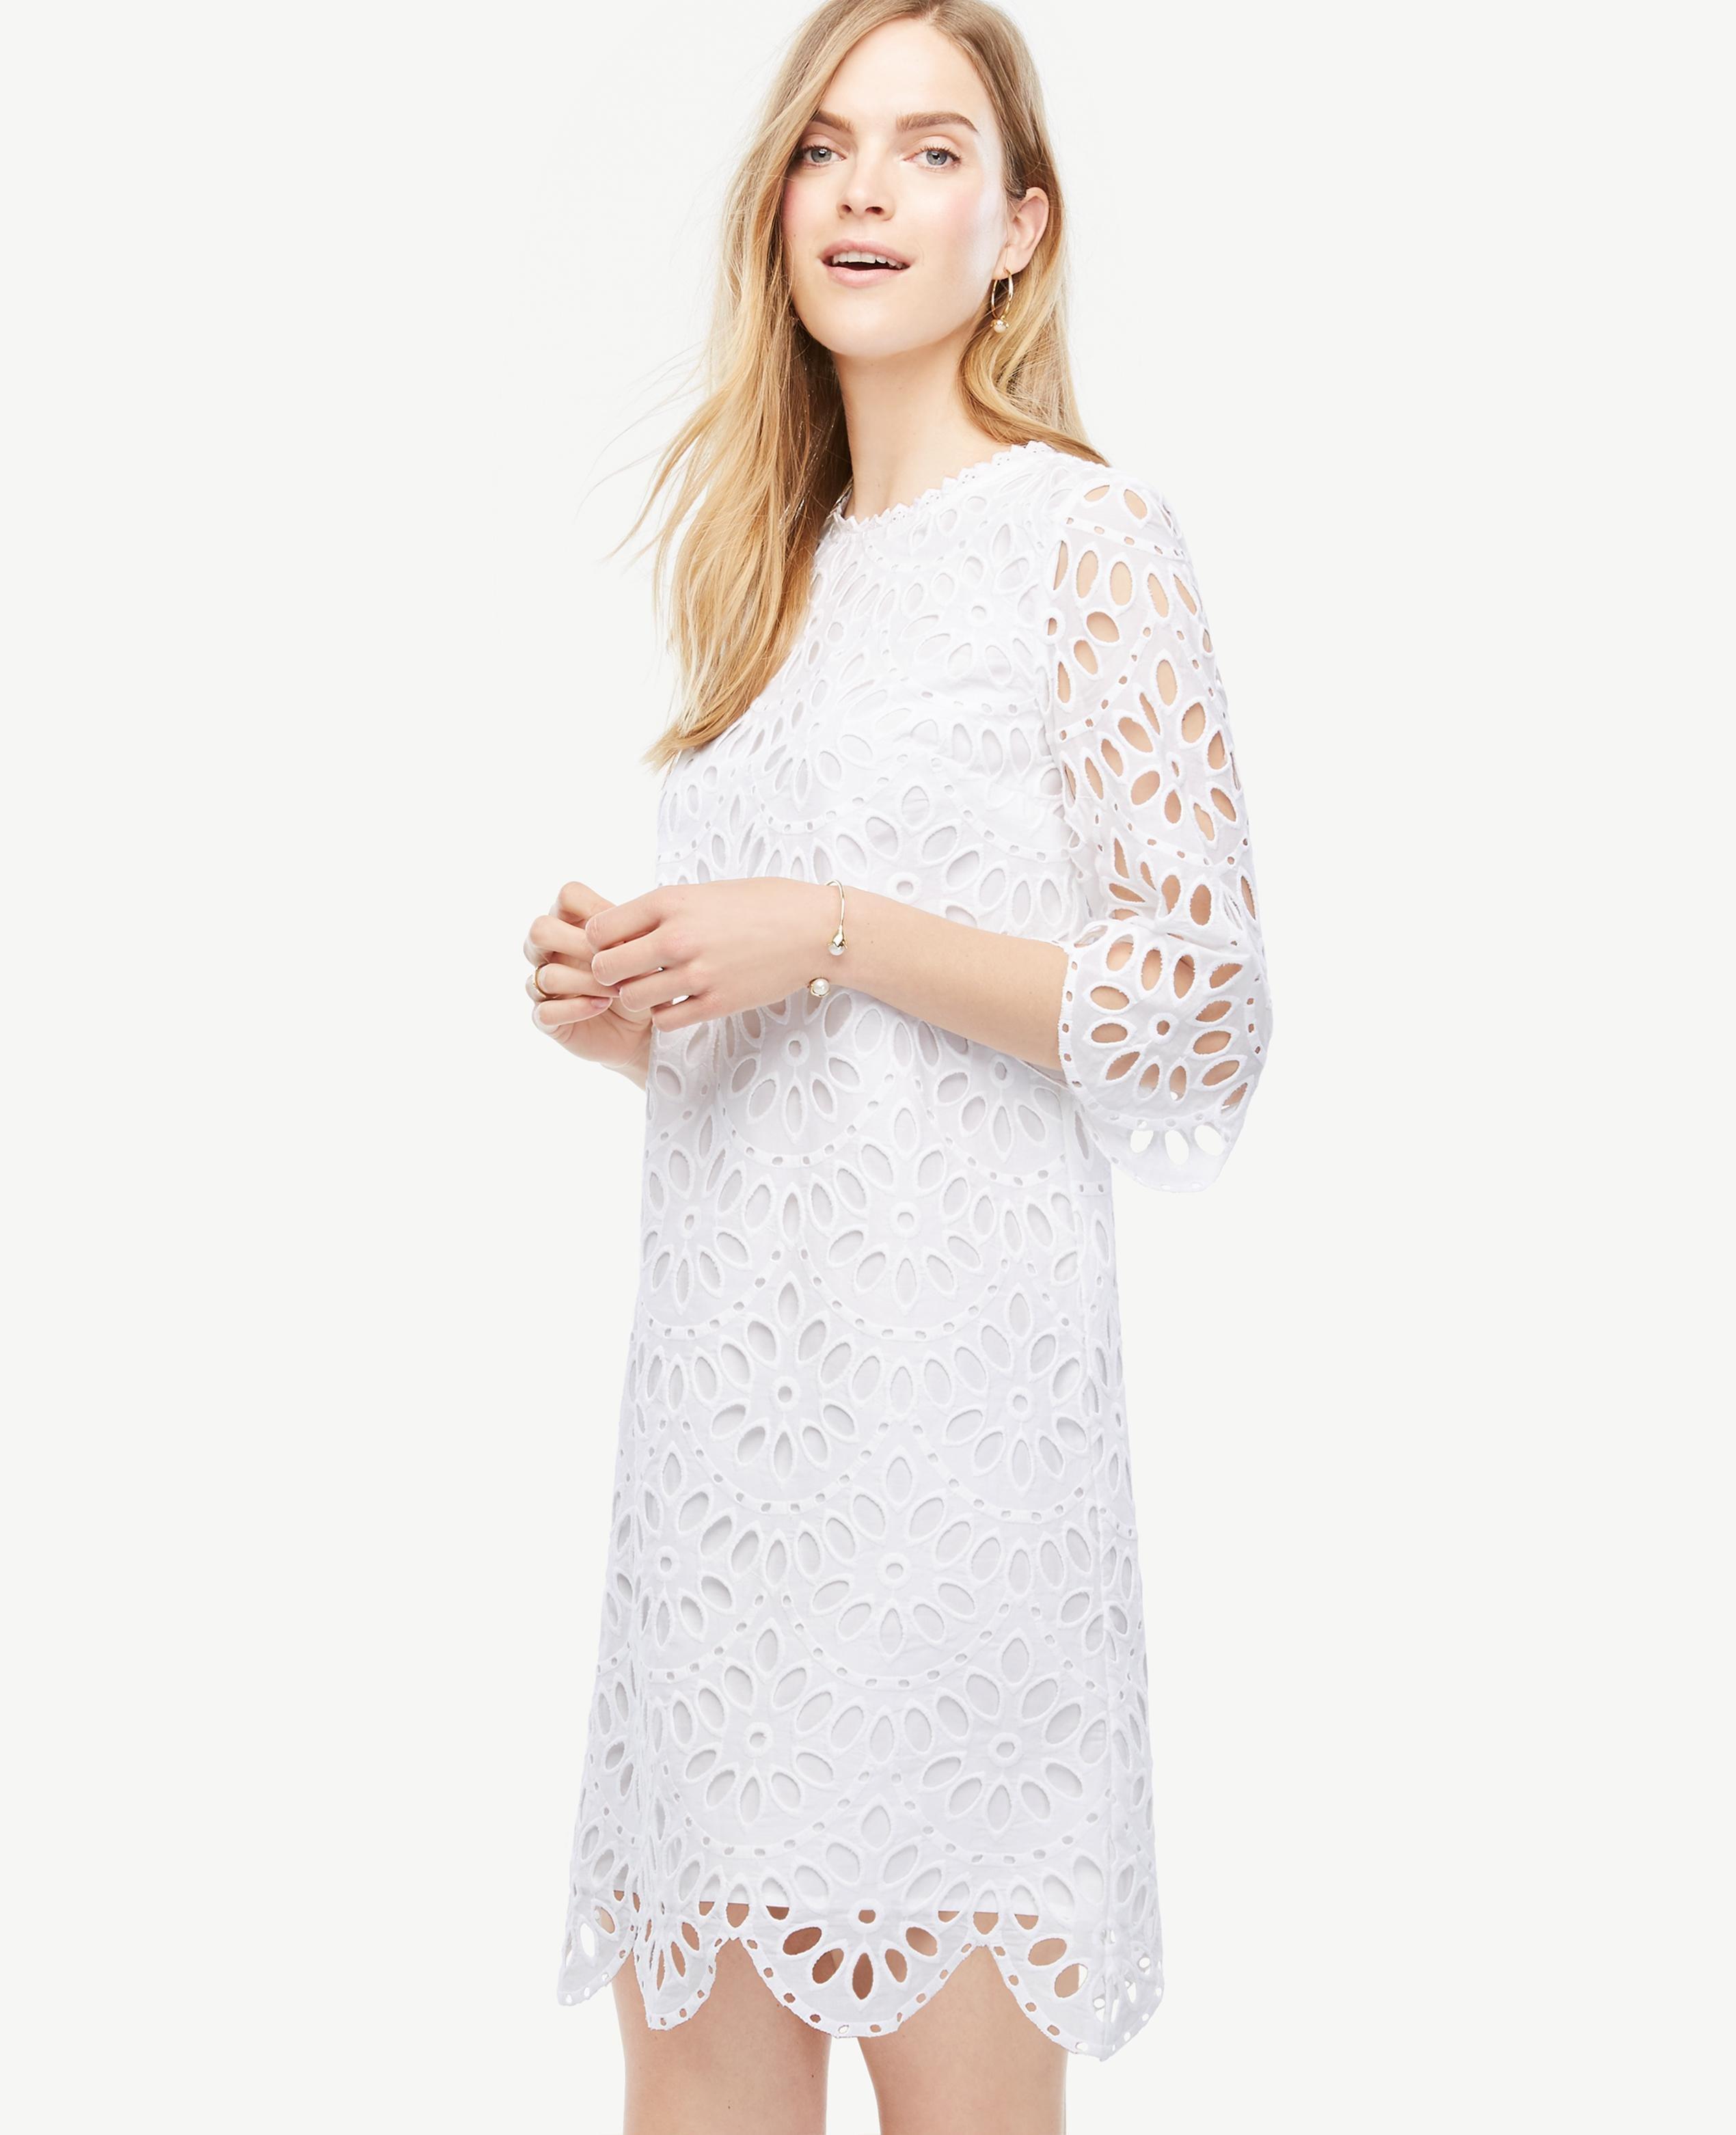 774b2e2c25f7 Lyst - Ann Taylor Scallop Eyelet Shift Dress in White